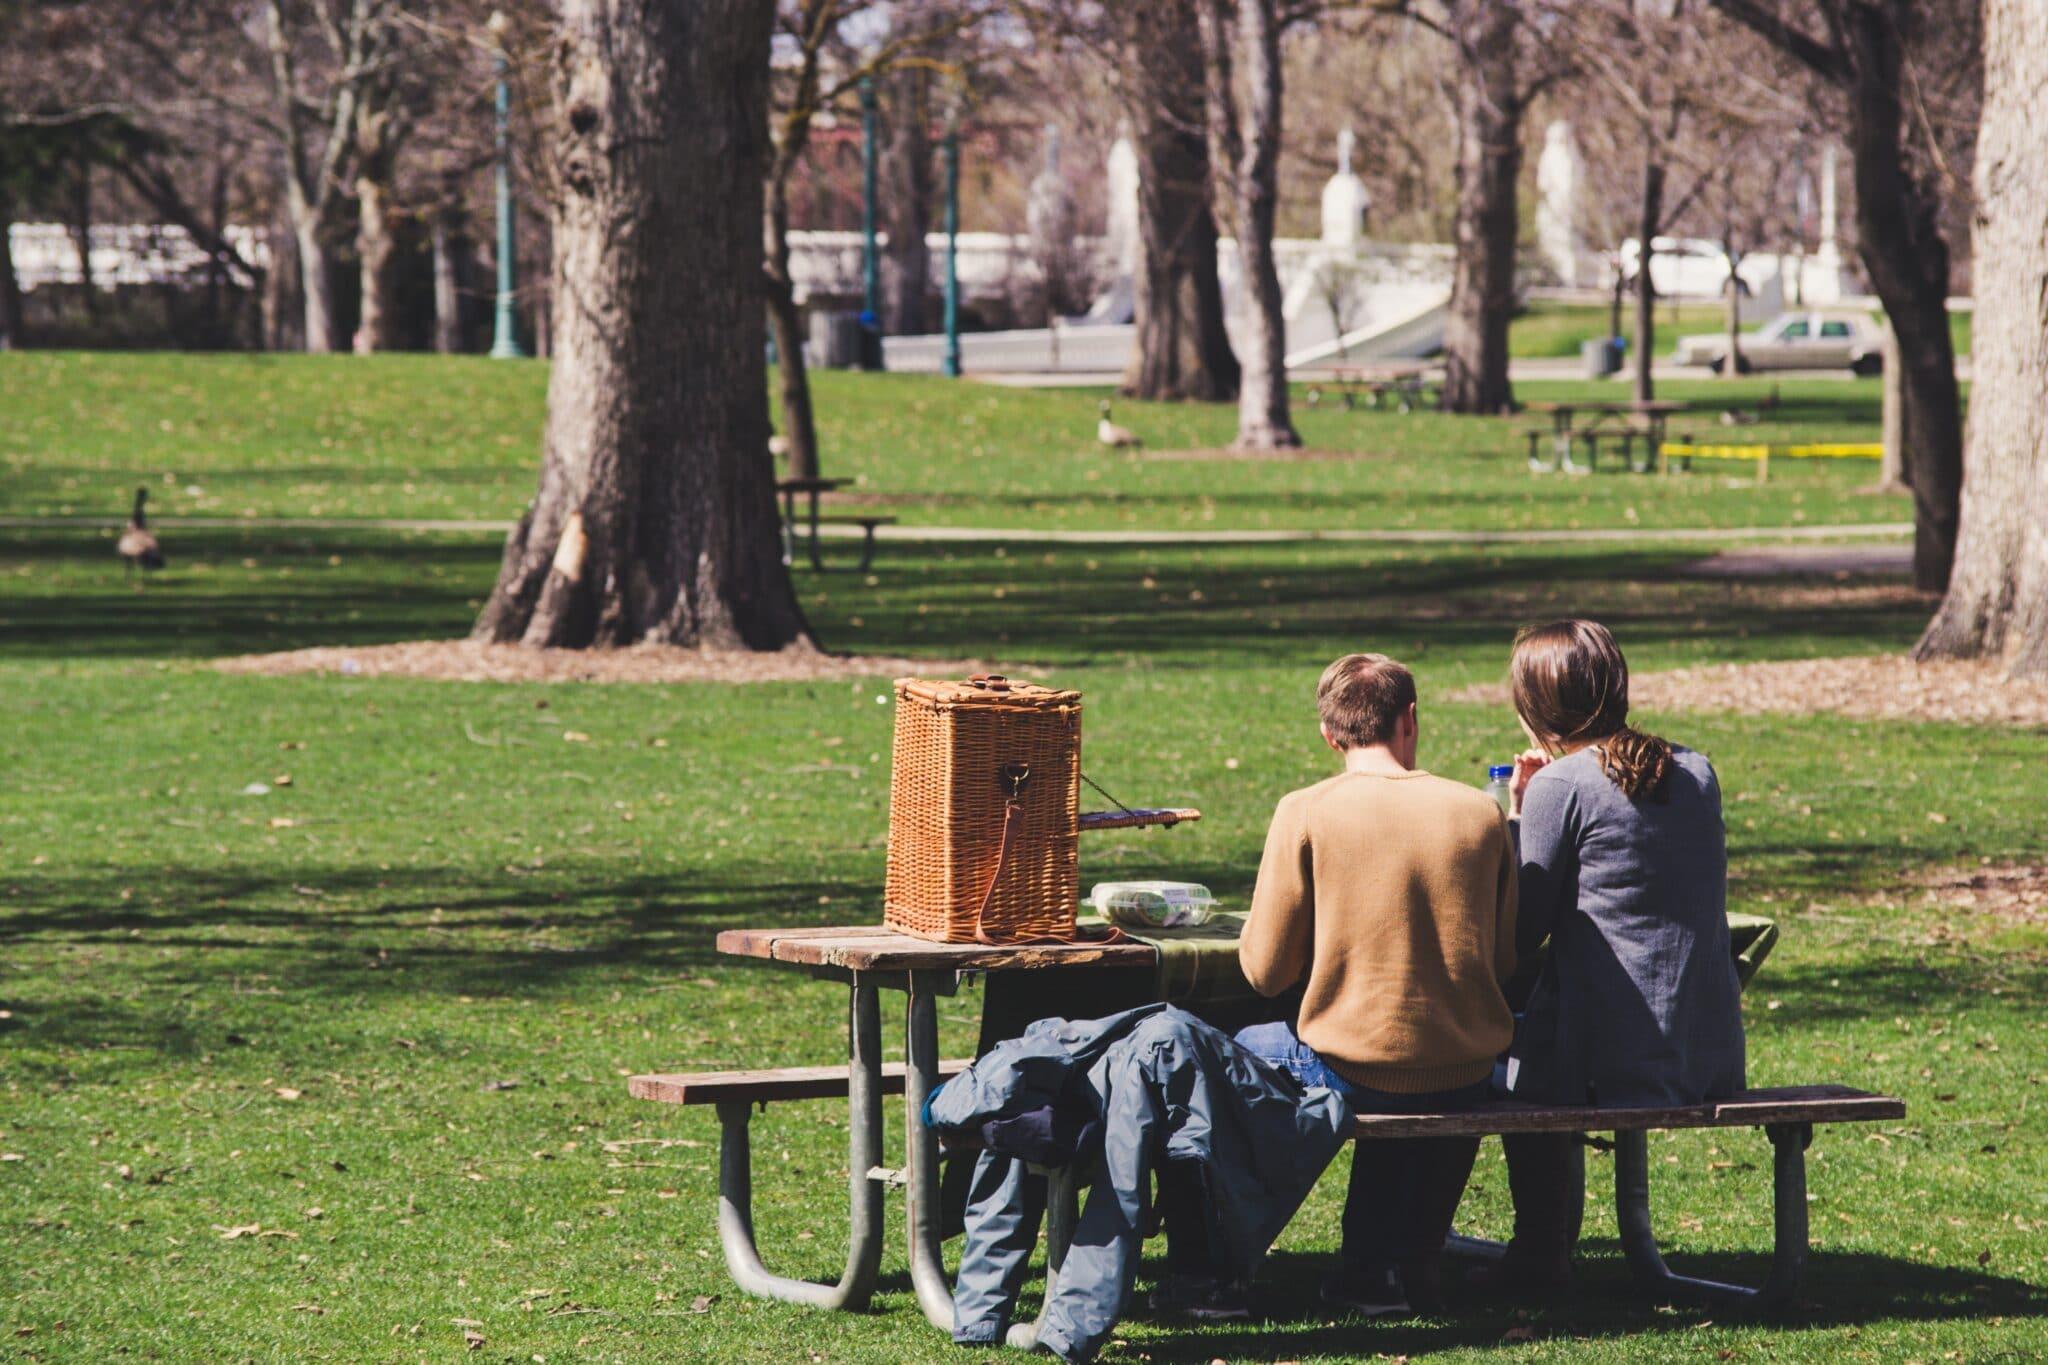 Teo people having a picnic at a park